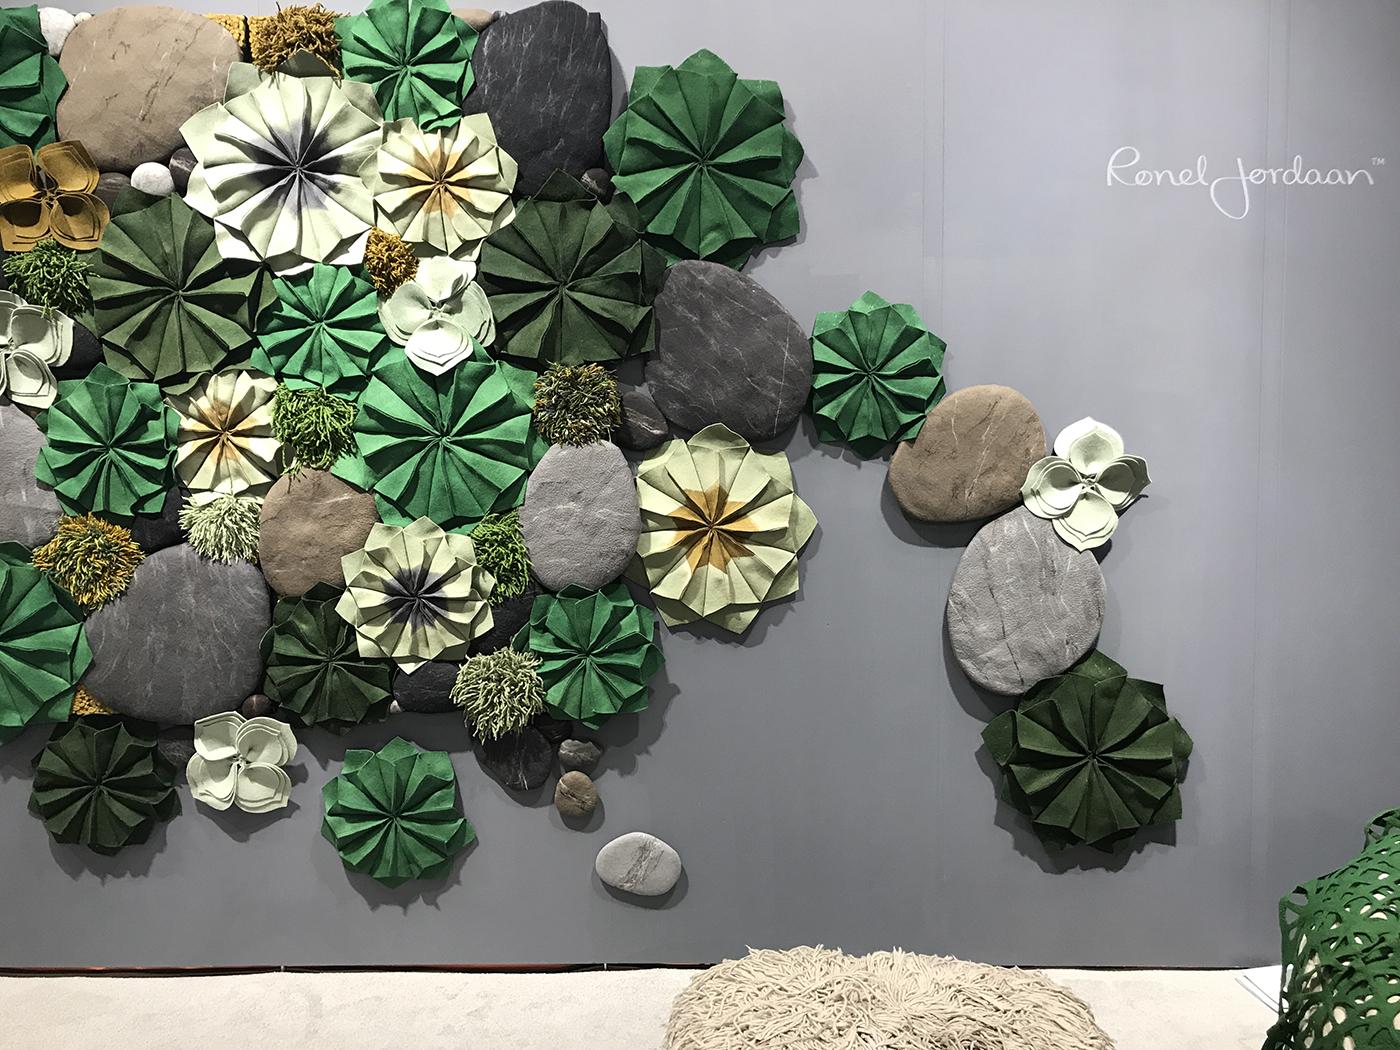 Felted Flower Wall Art from Ronel Jordaan